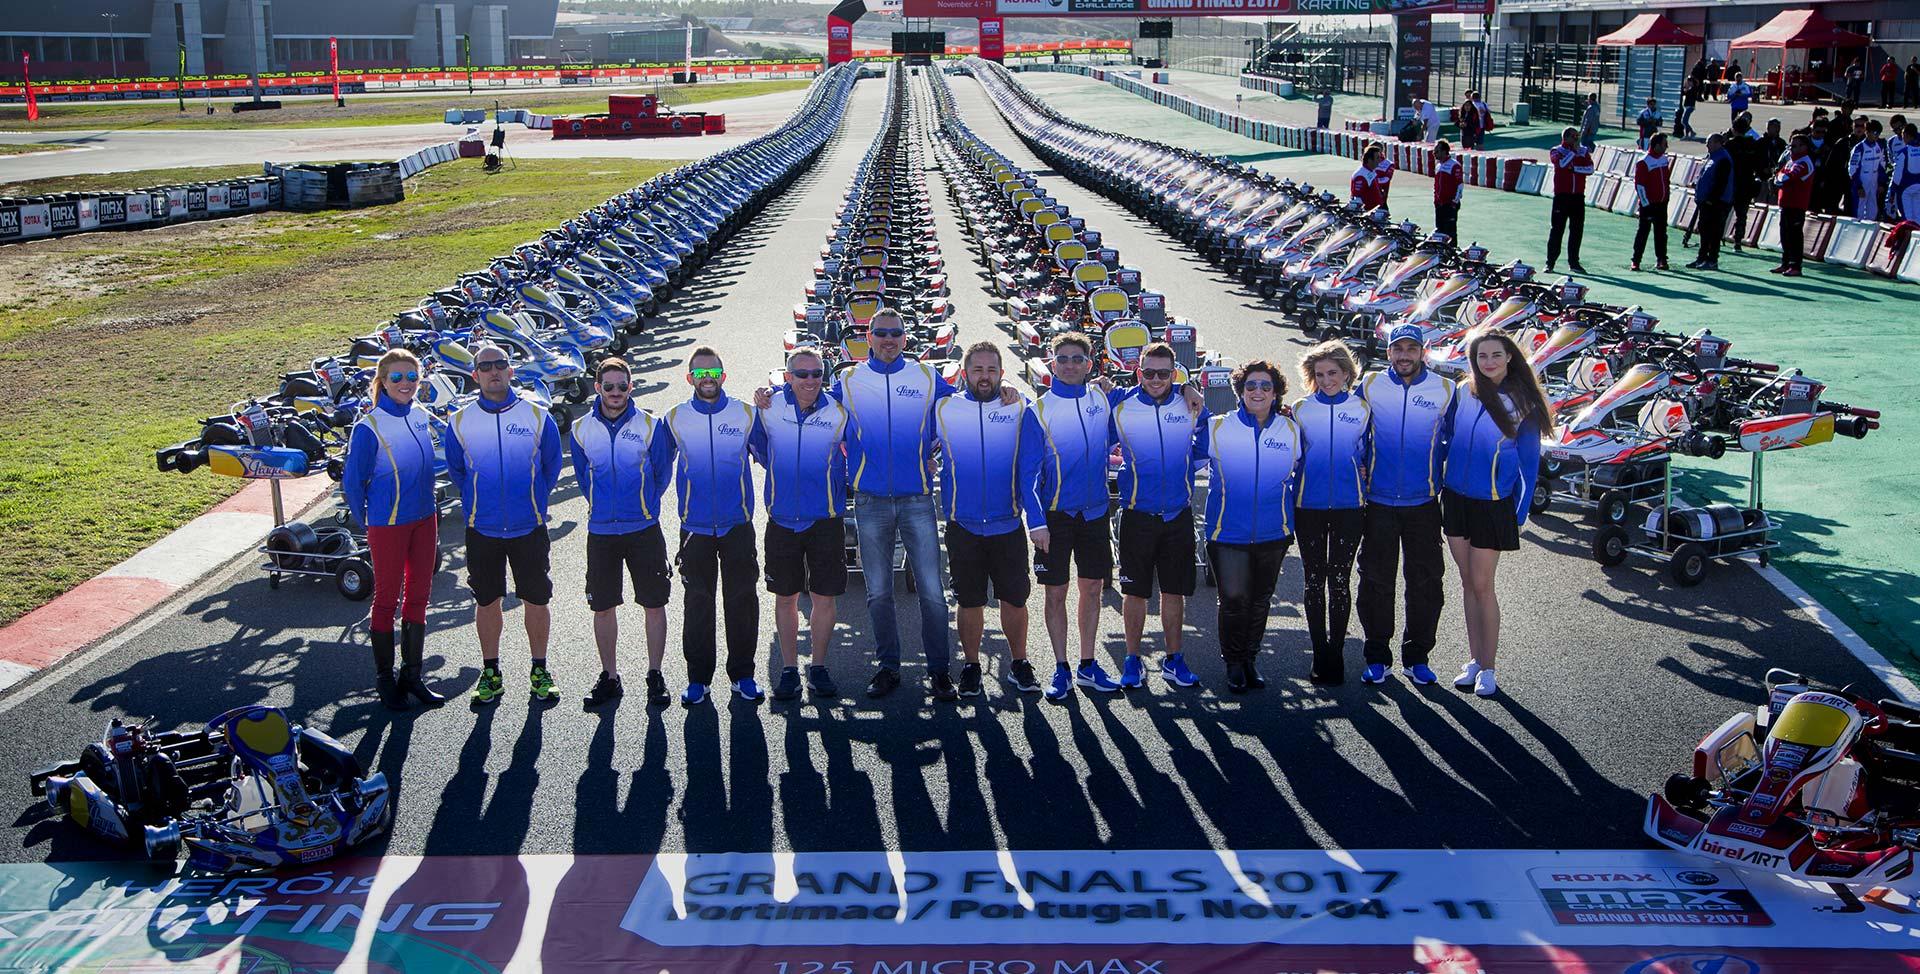 Rotax Grand Finals: Praga Kart will be there!